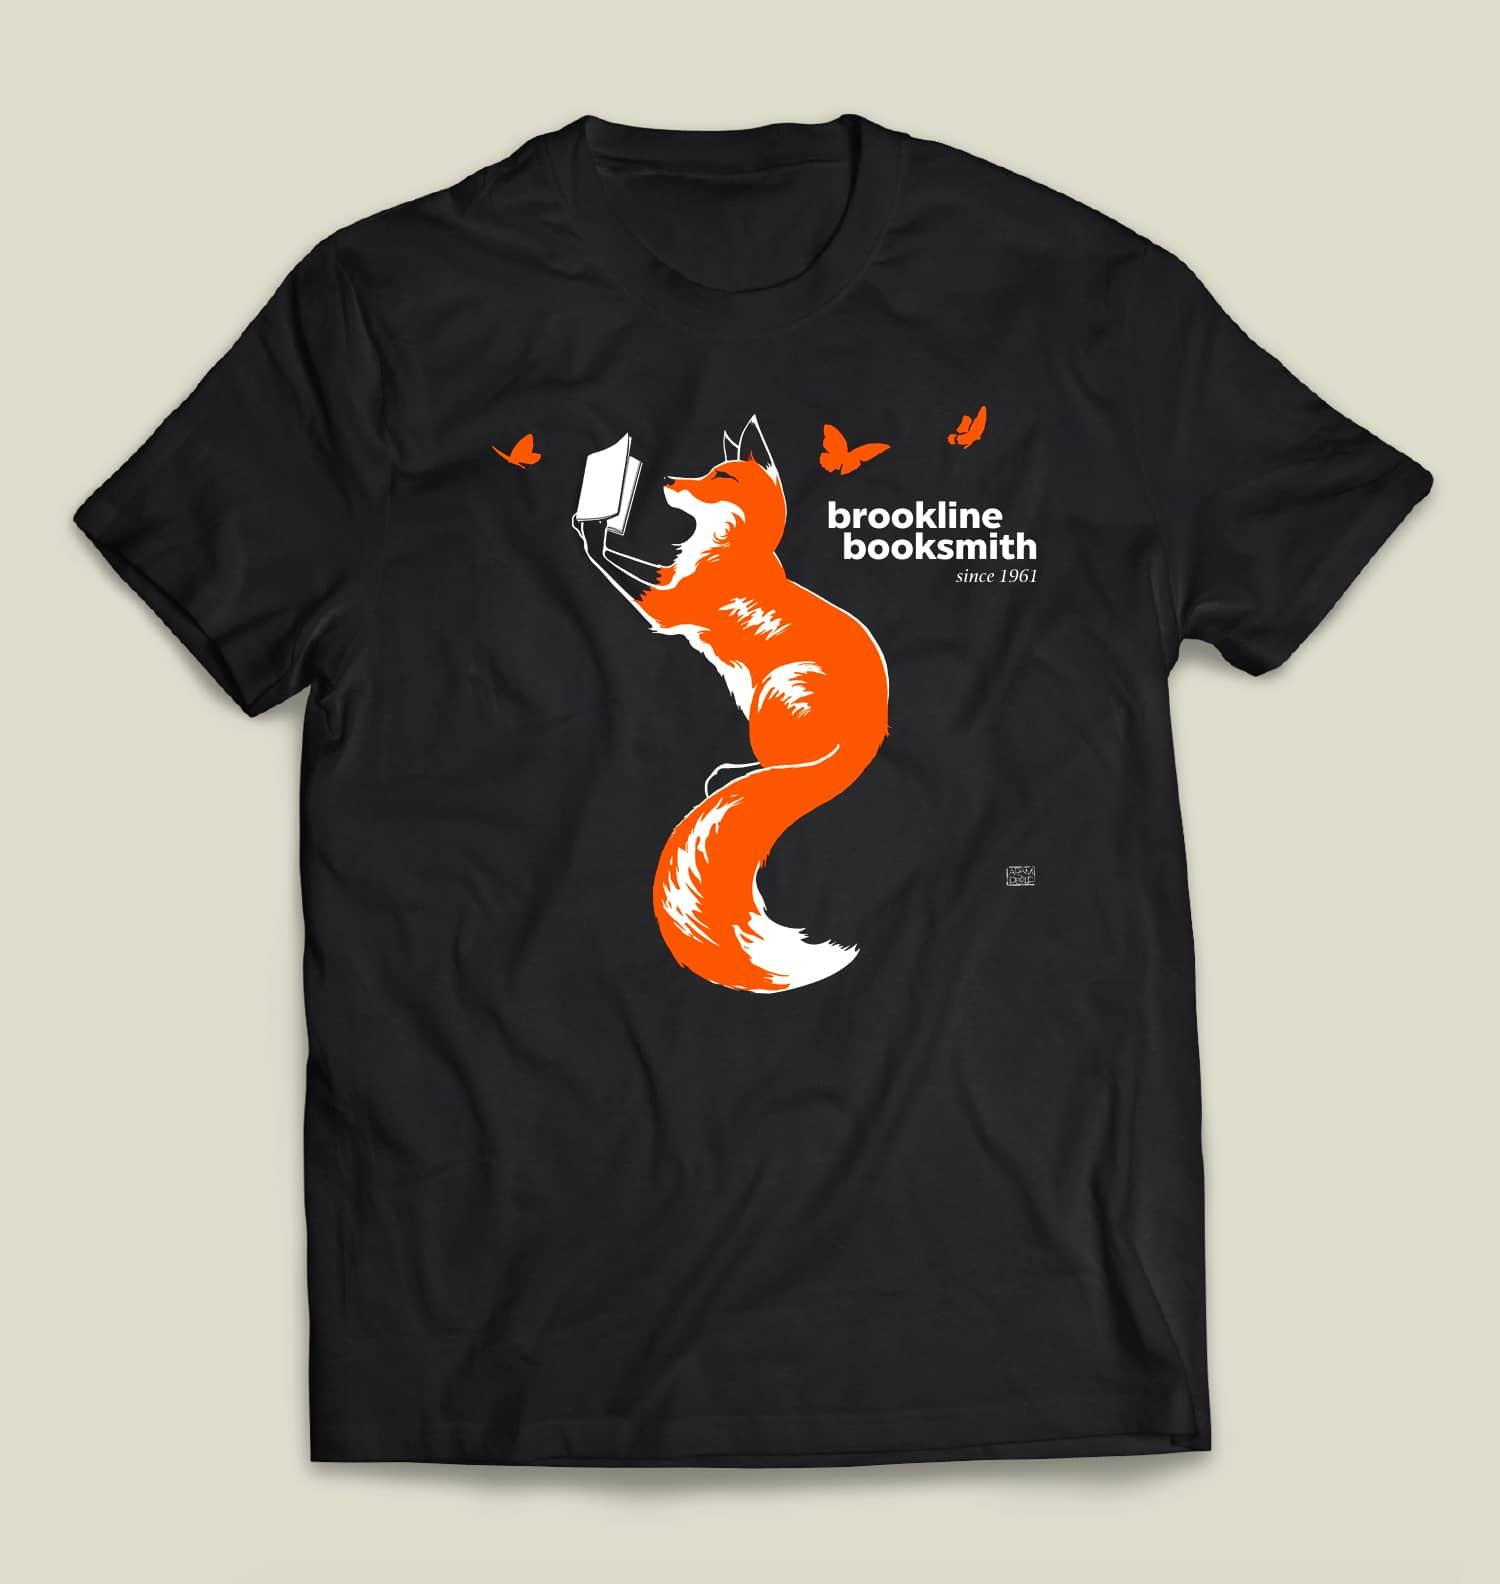 Booksmith 60th Anniversary Fox T-Shirt